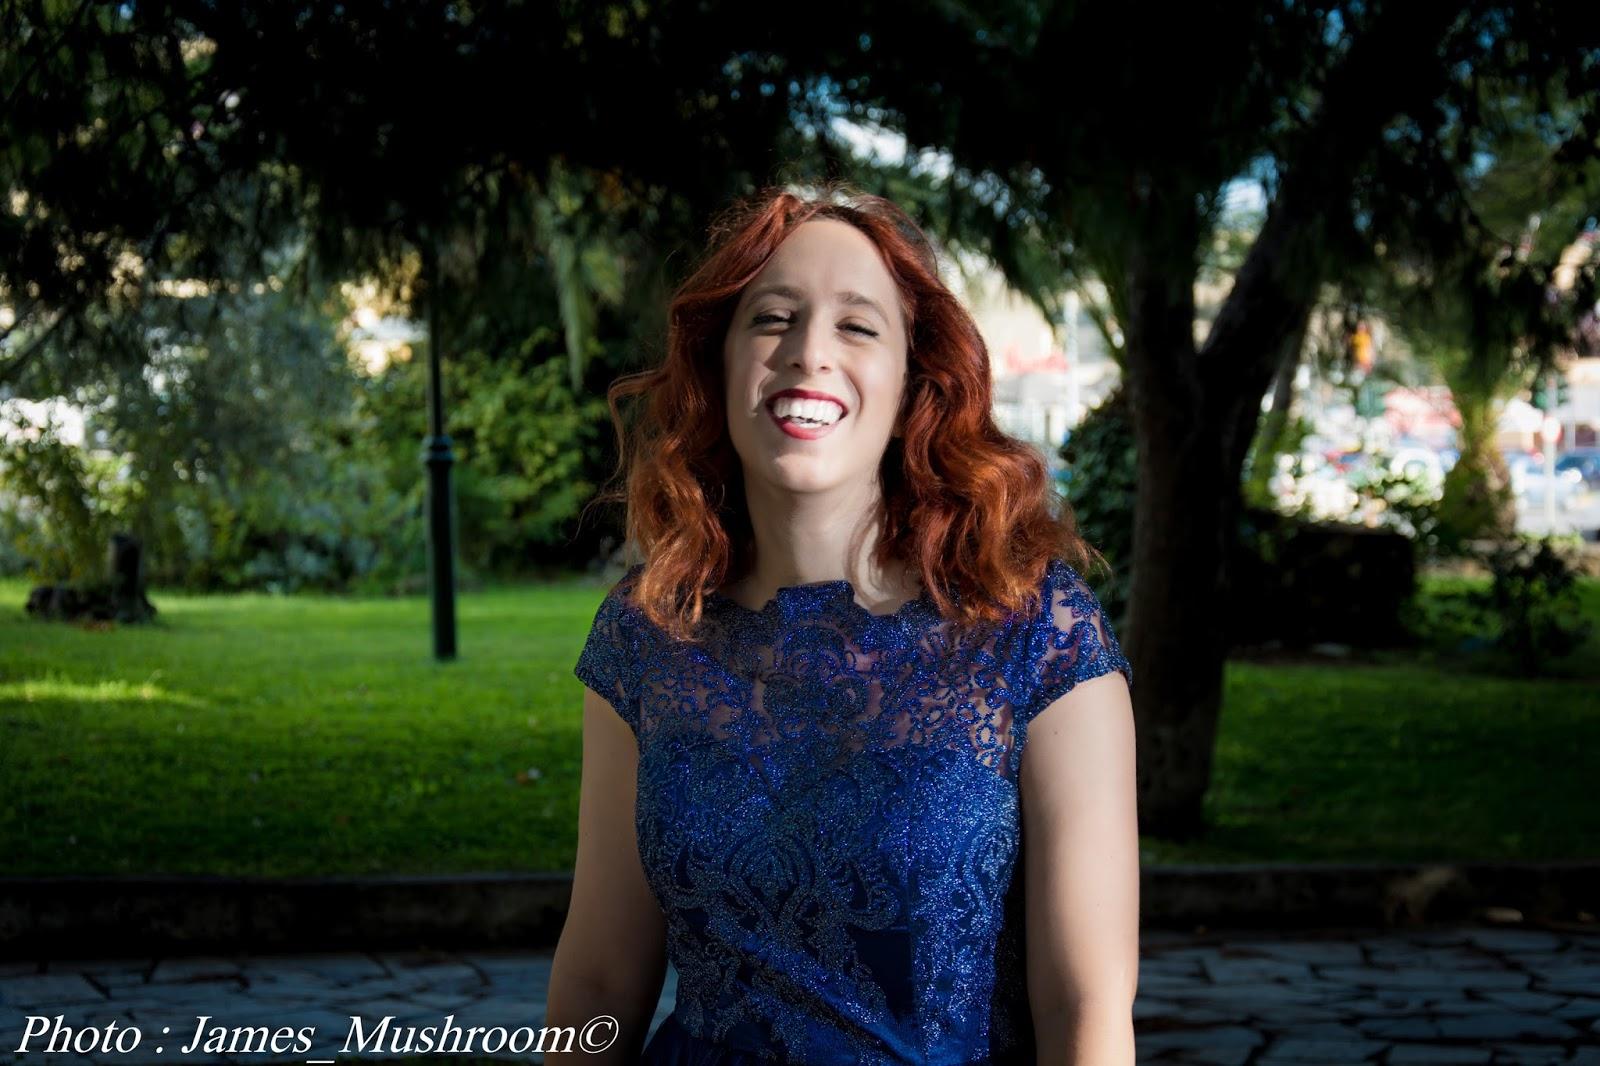 spotlights on the redhead, redhead, model, blogger, review, pretty, anna keni, anna, hot,sexy, chichi London,review occasion dress, navy, blue, lace,midi, white, laser-cut, ashley bridget,james mushroom